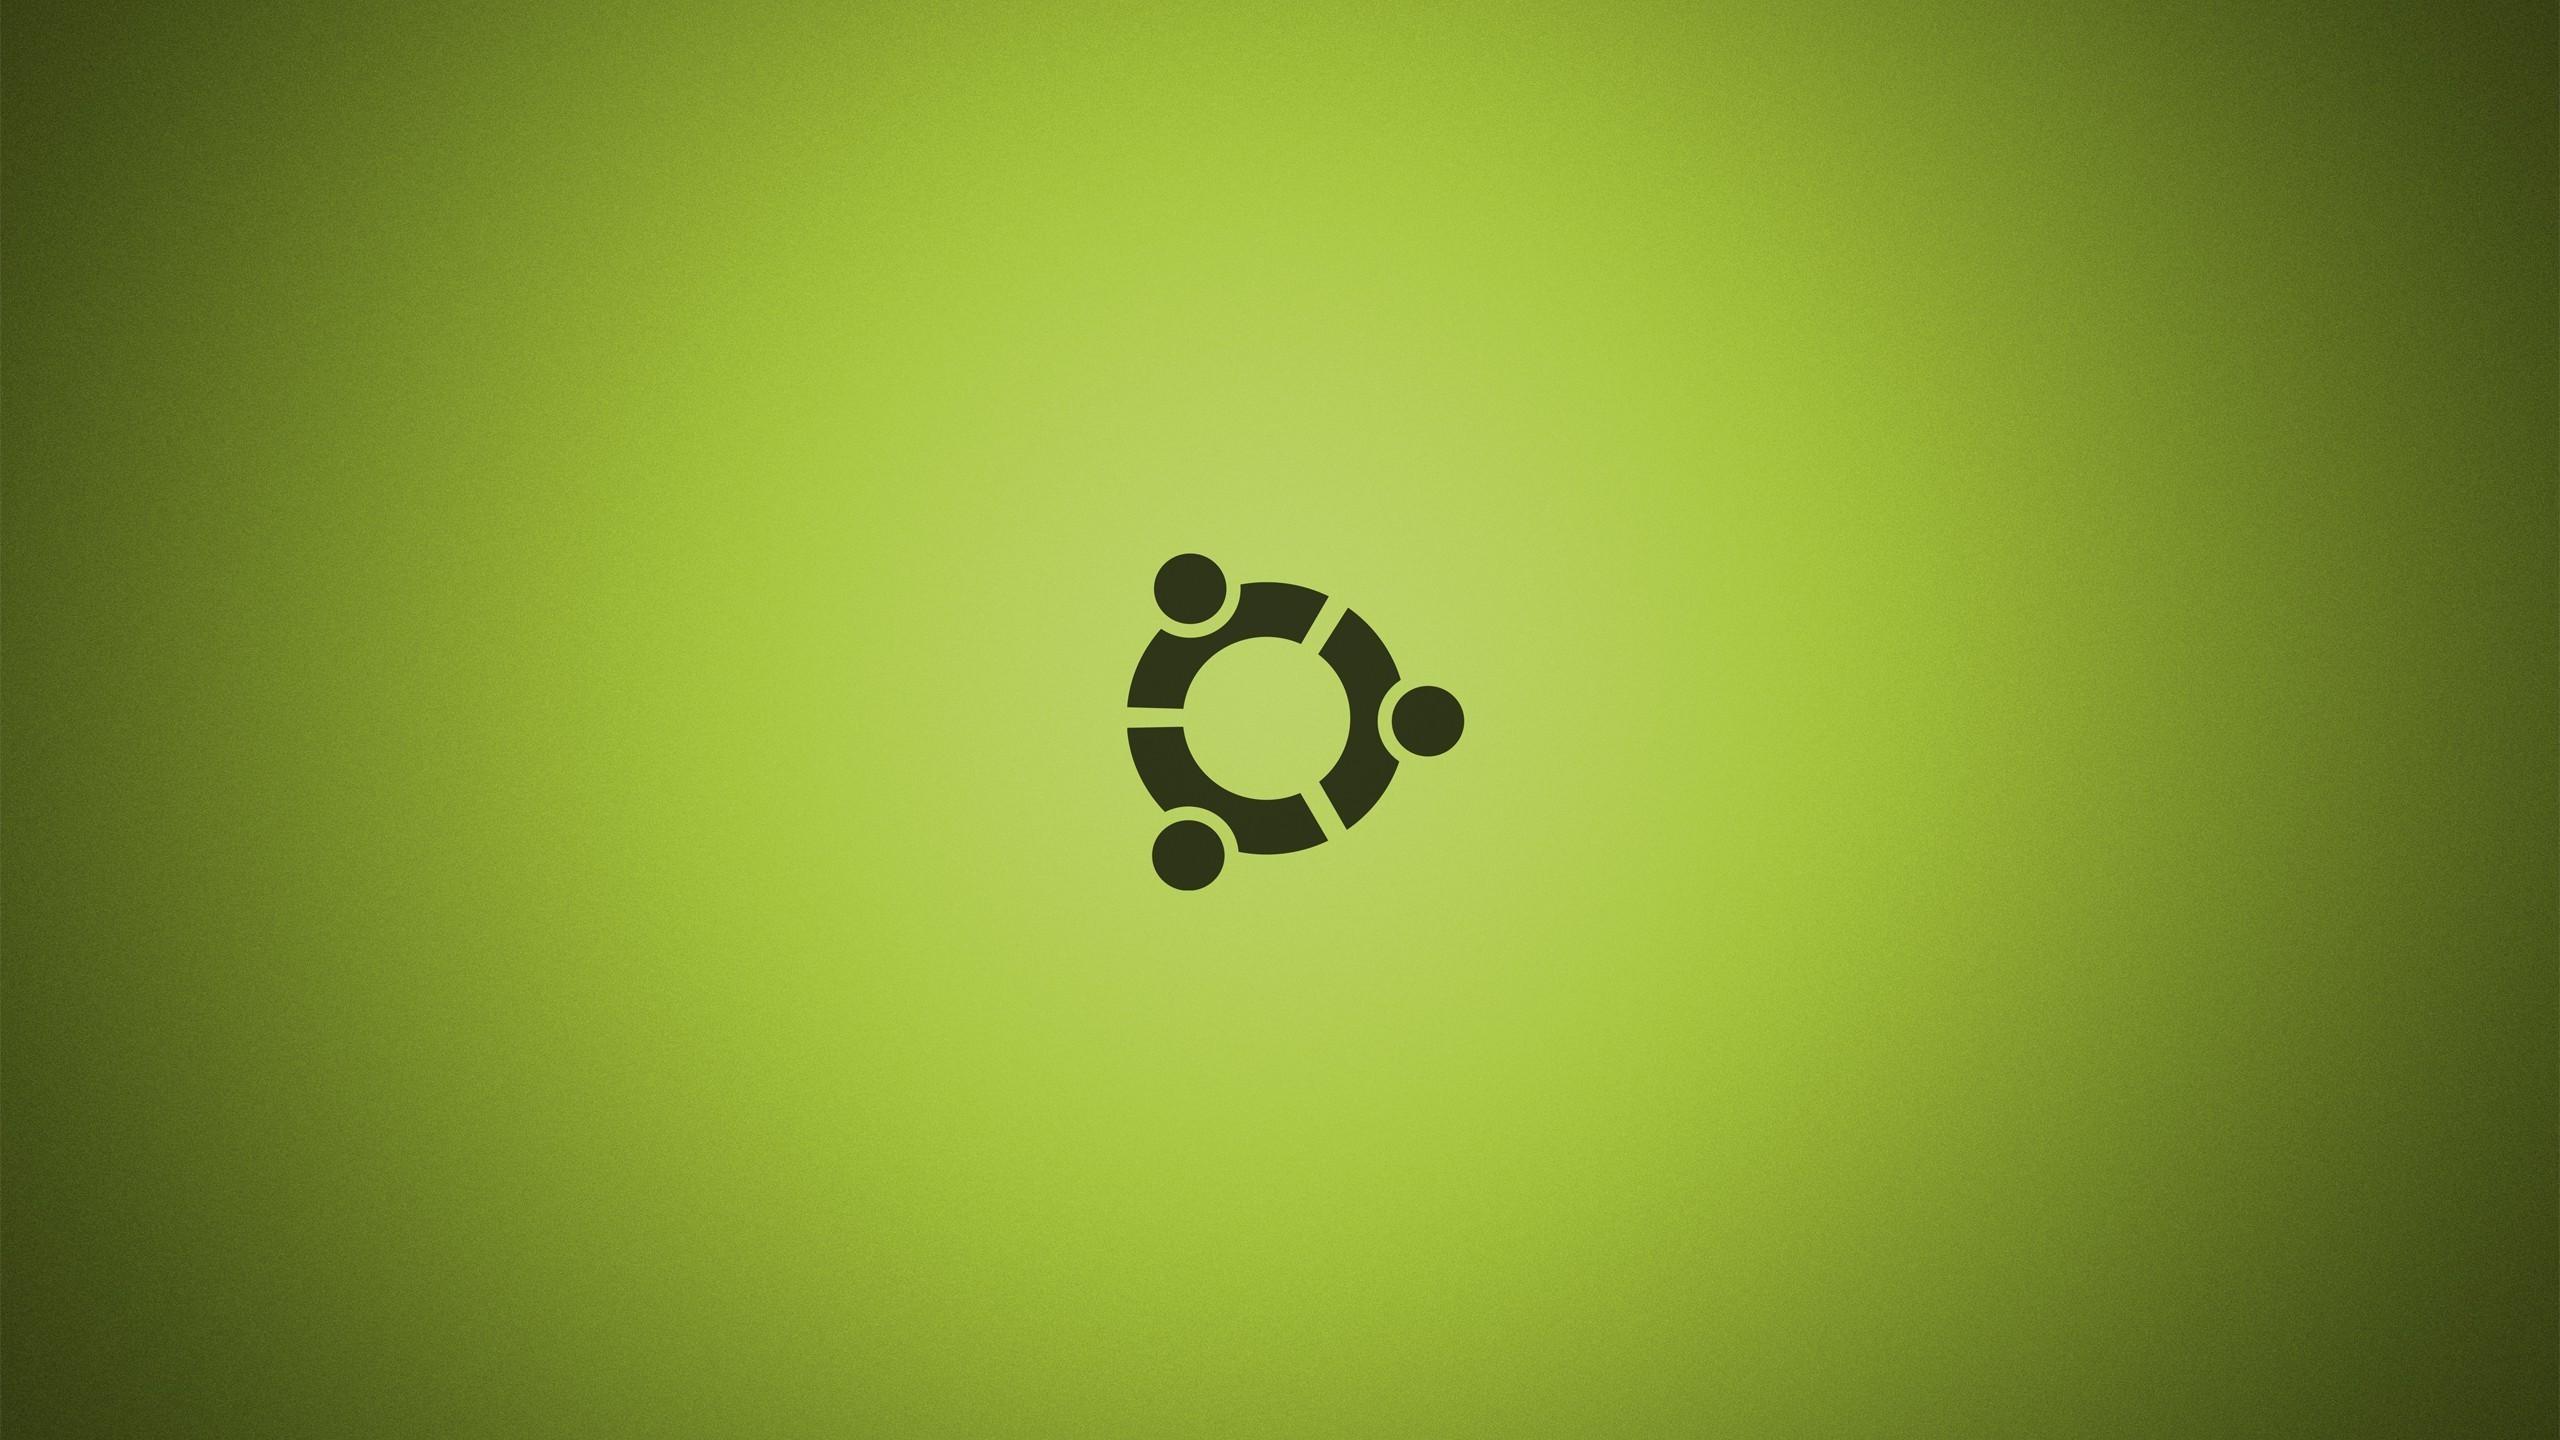 free ubuntu wallpaper 40659